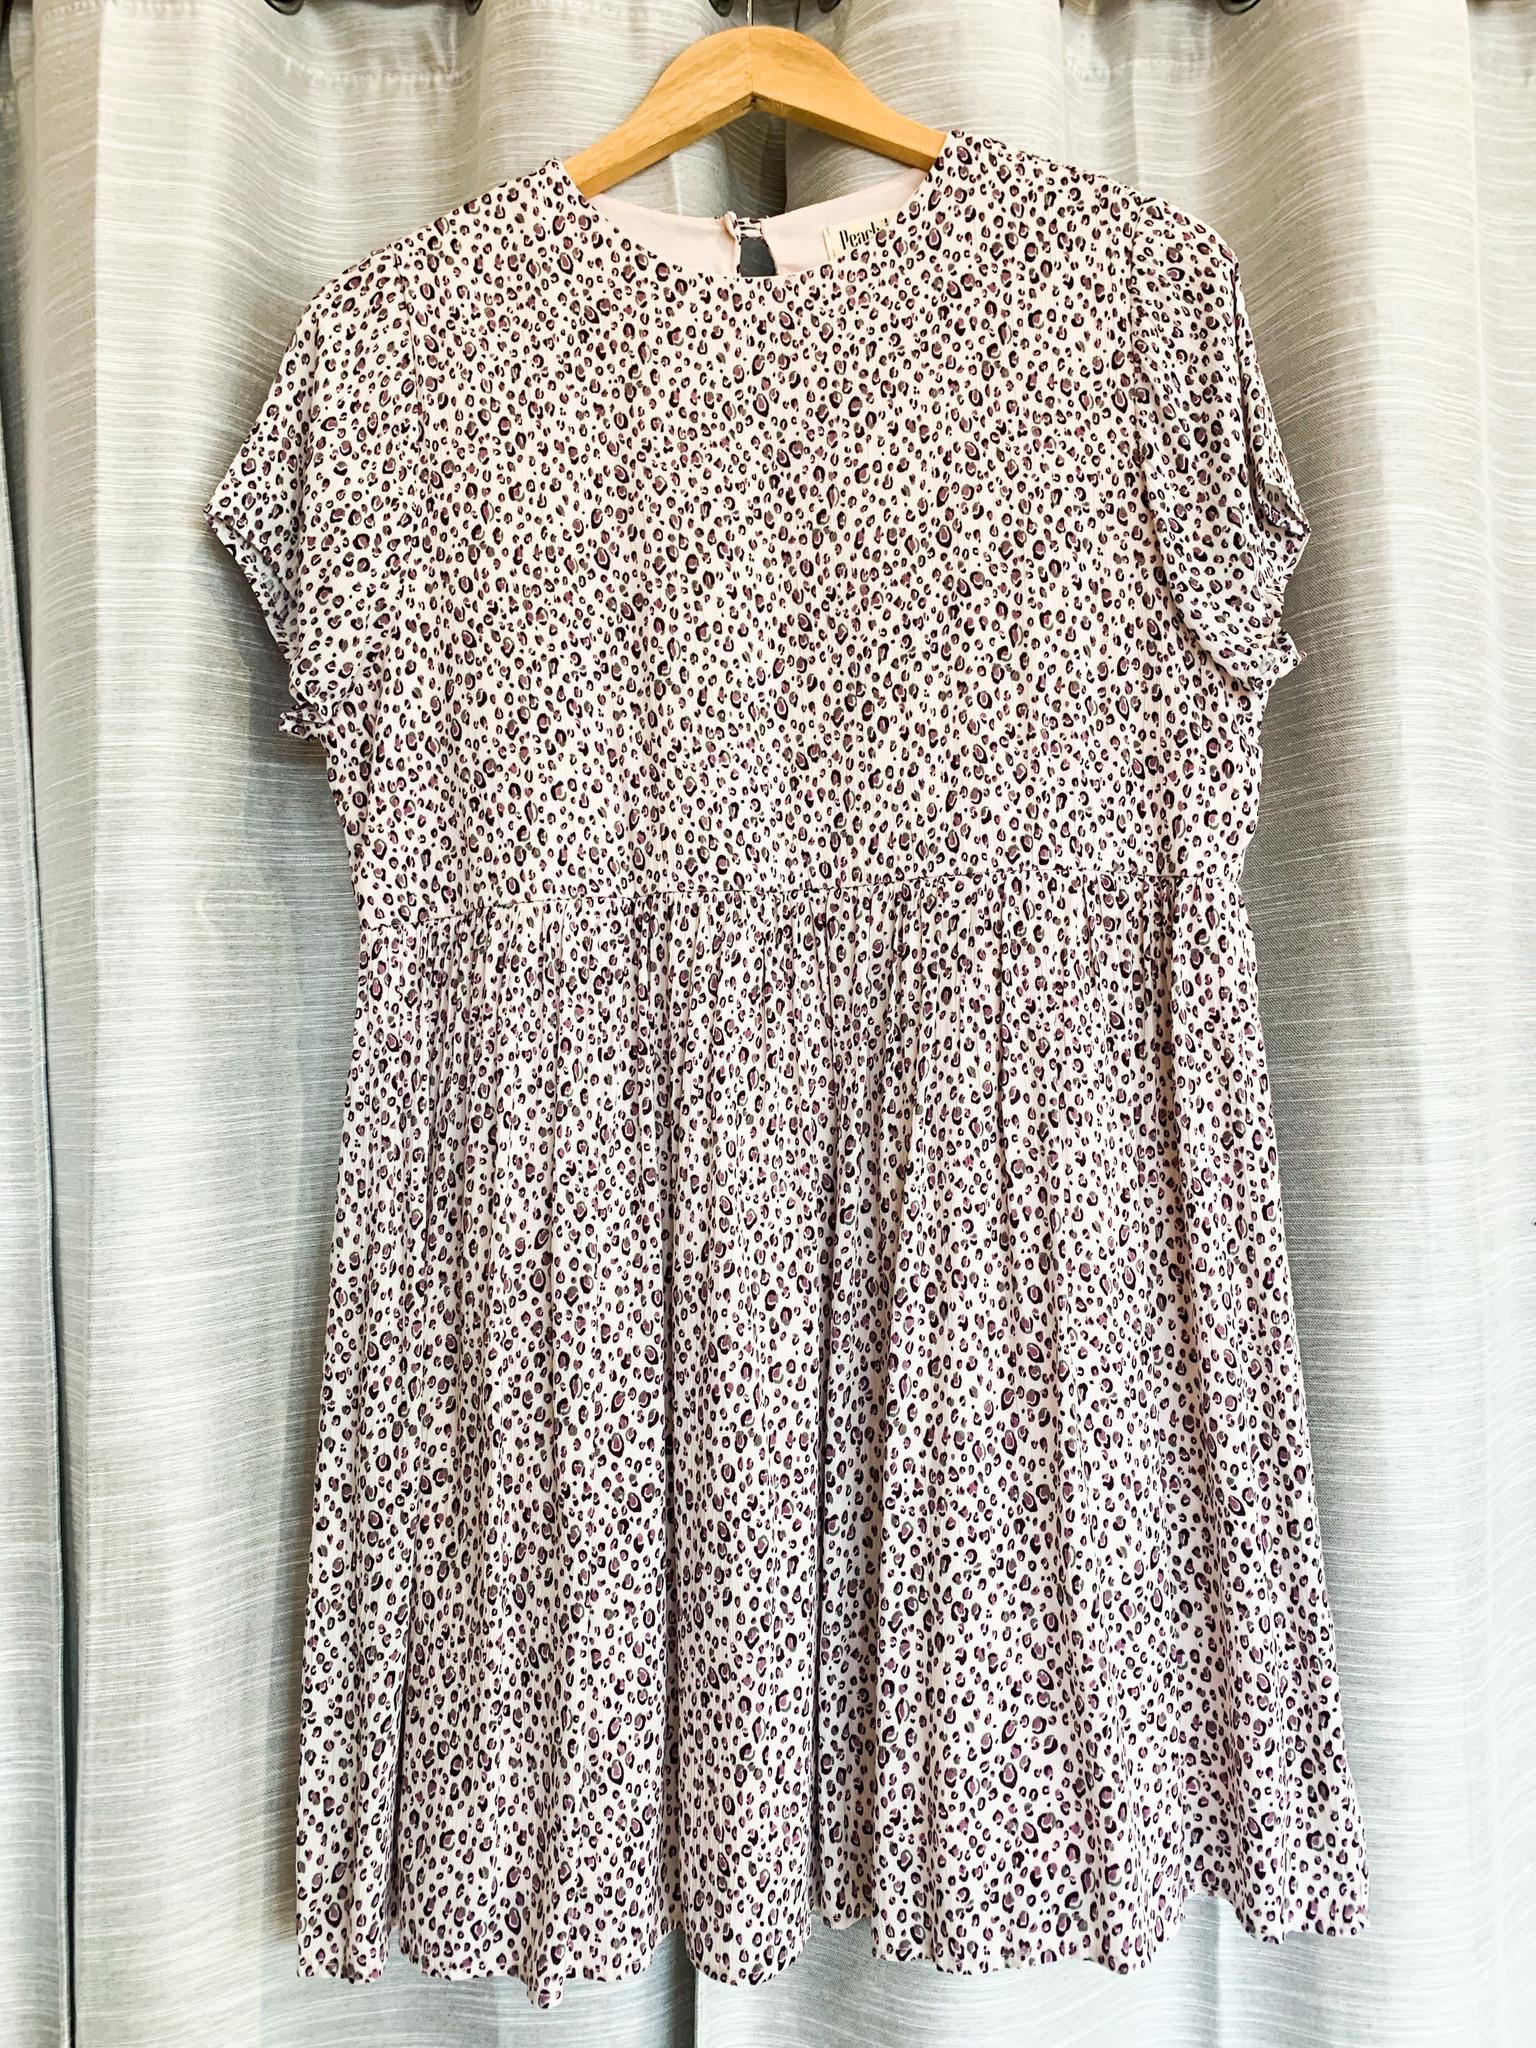 Blush Burgundy Animal Print Dress